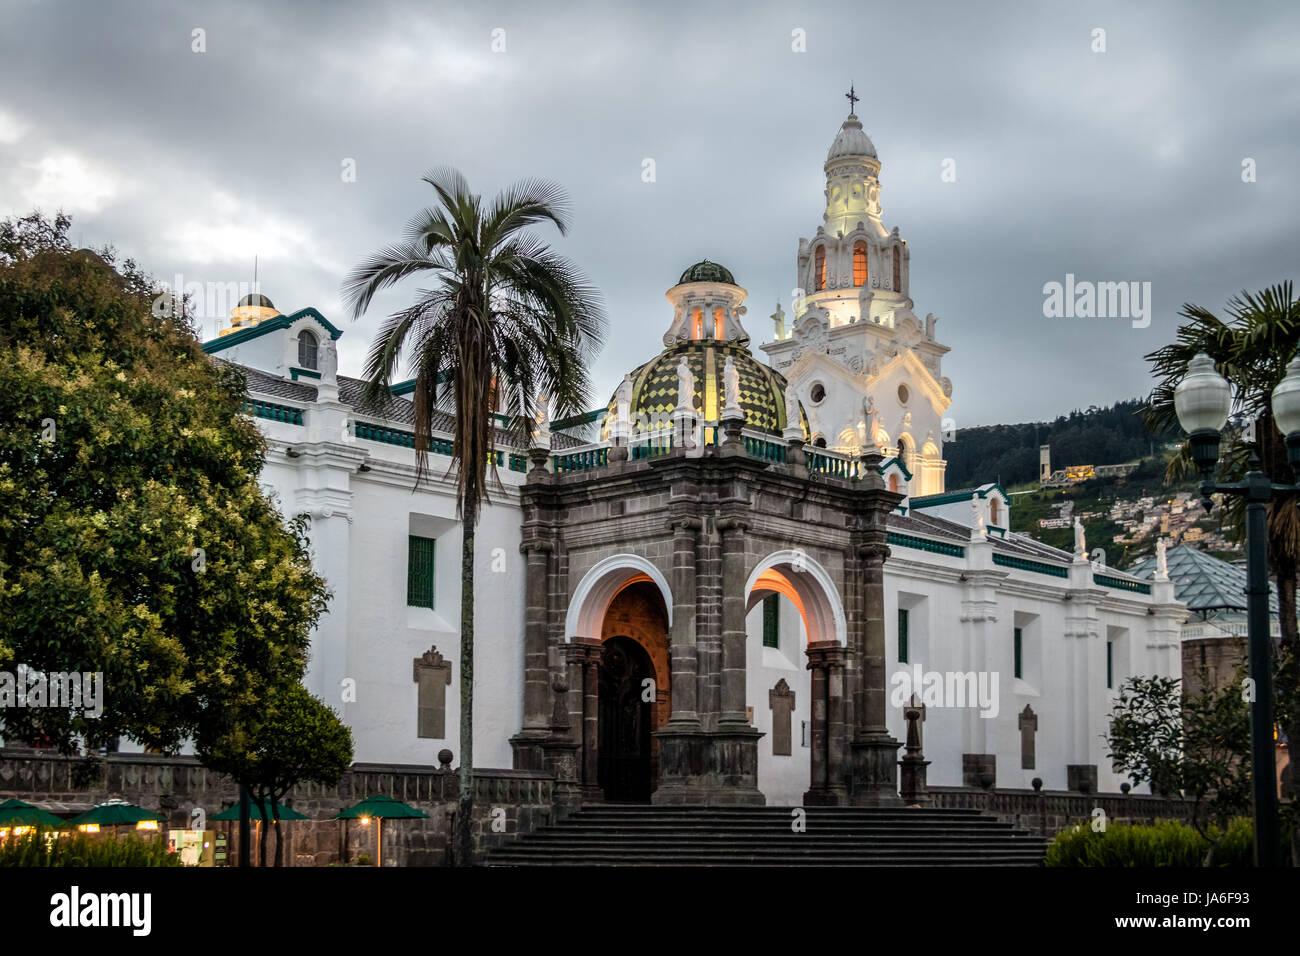 Plaza Grande und Metropolitan-Kathedrale - Quito, Ecuador Stockbild